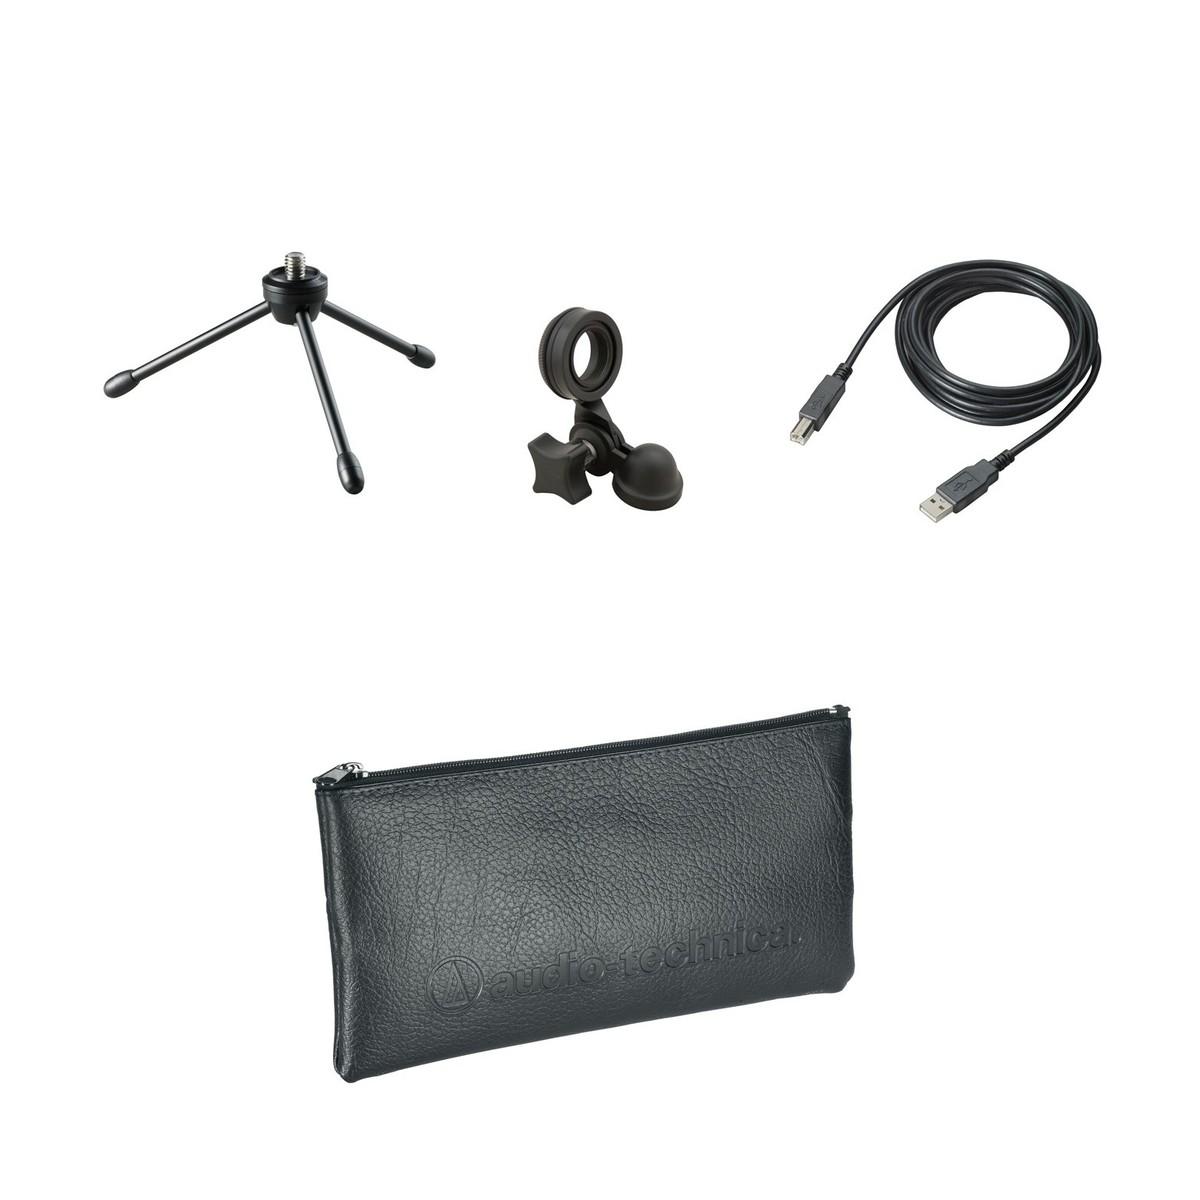 Audio Technica AT2020USB Pluss Kondensatormikrofon med